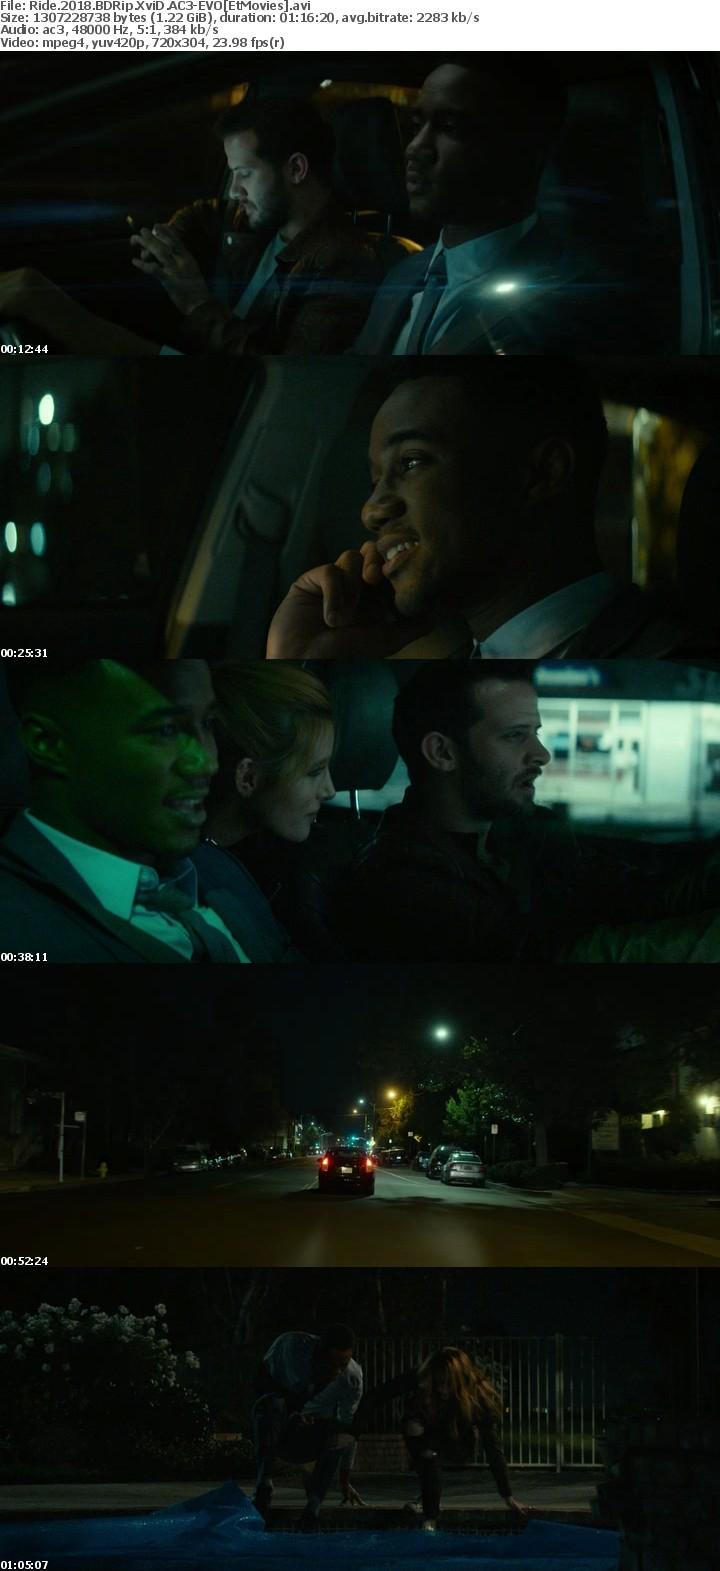 Ride 2018 BDRip XviD AC3-EVO[EtMovies]